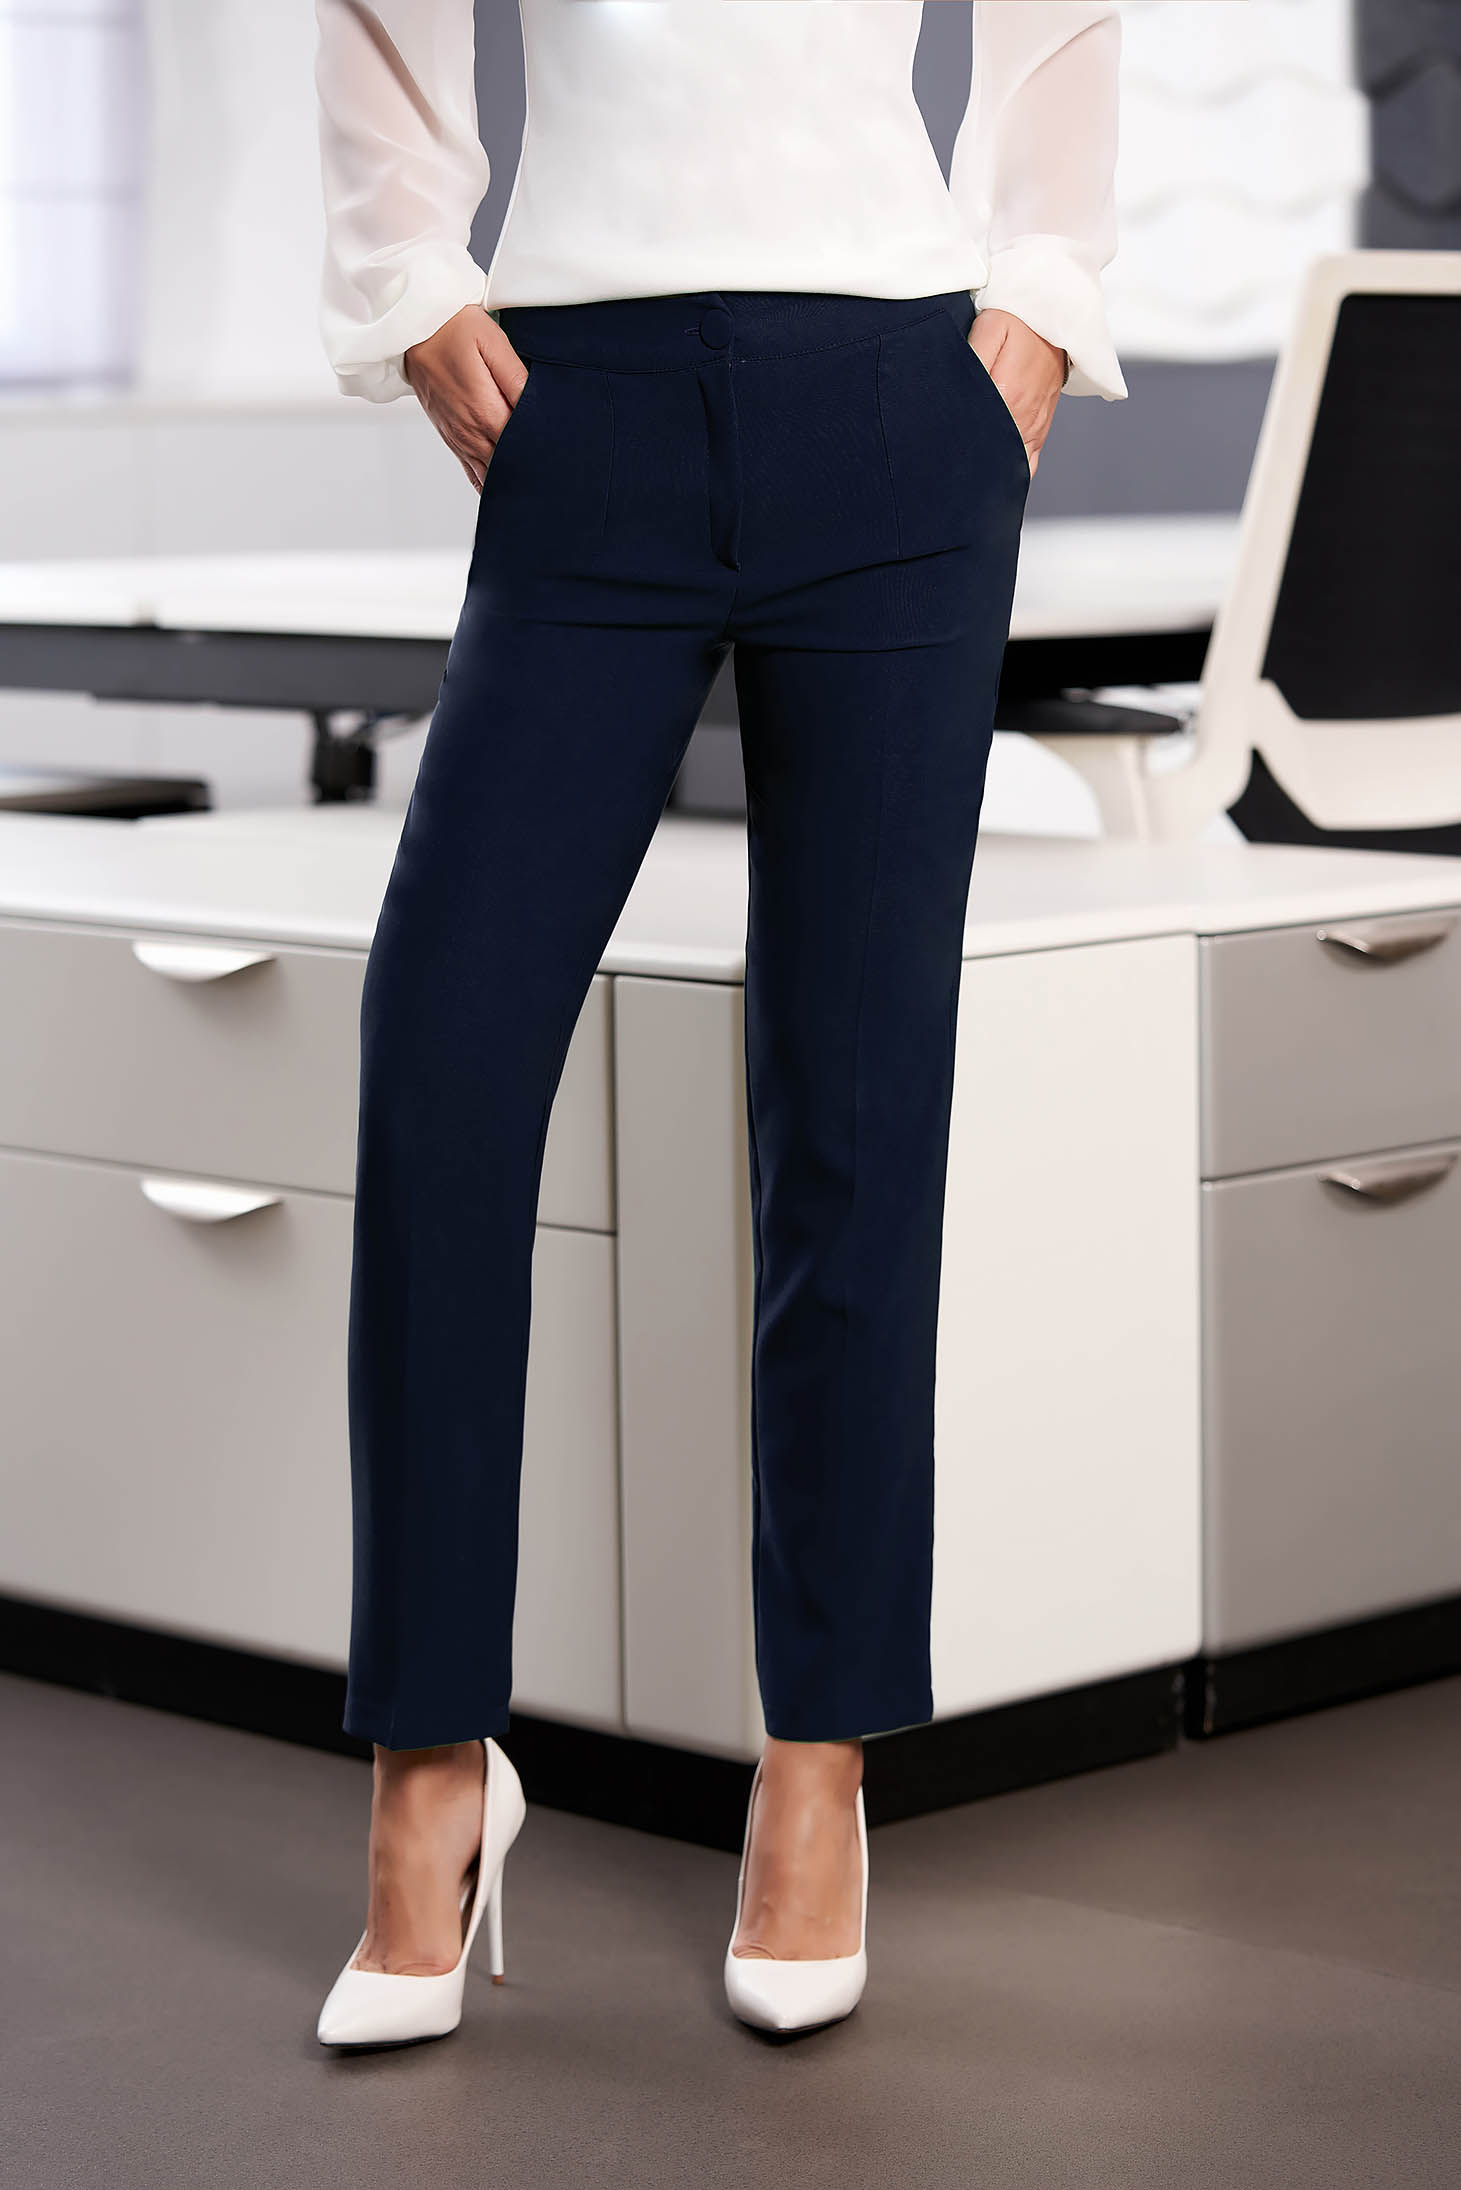 Trousers darkblue office cloth medium waist straight